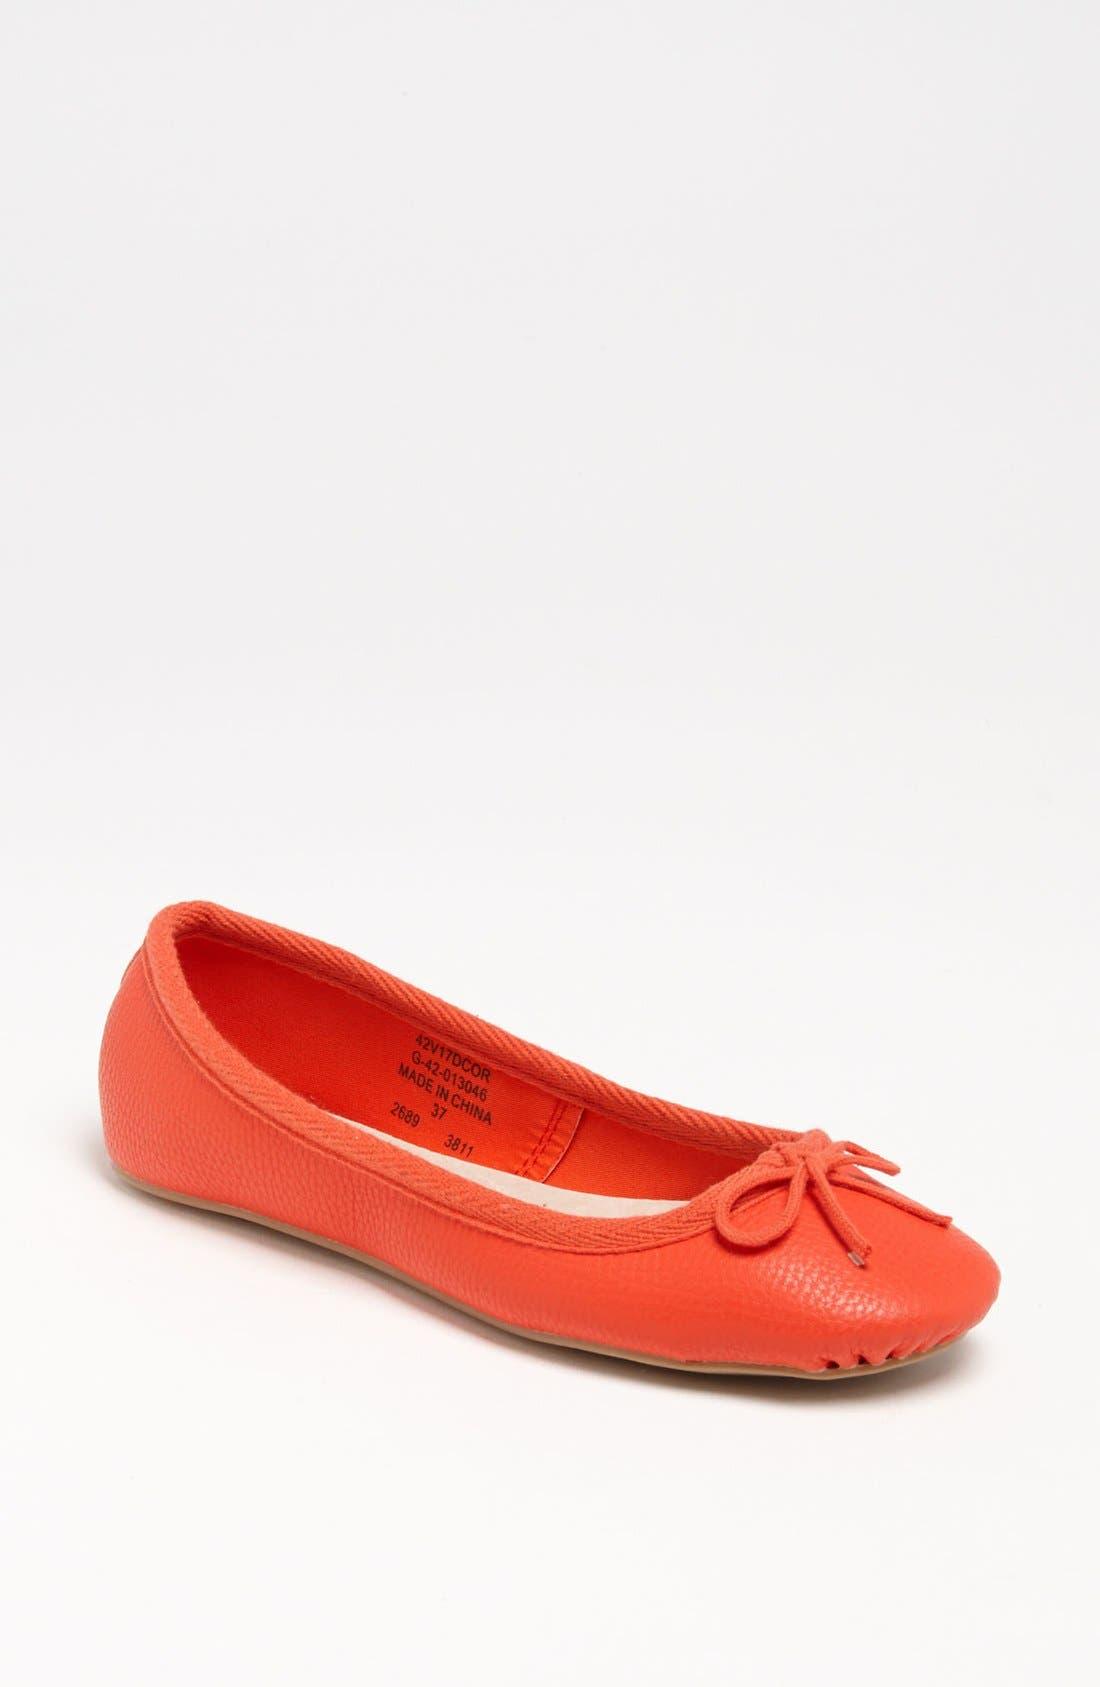 Main Image - Topshop 'Vibrant Tumbled' Ballerina Flat